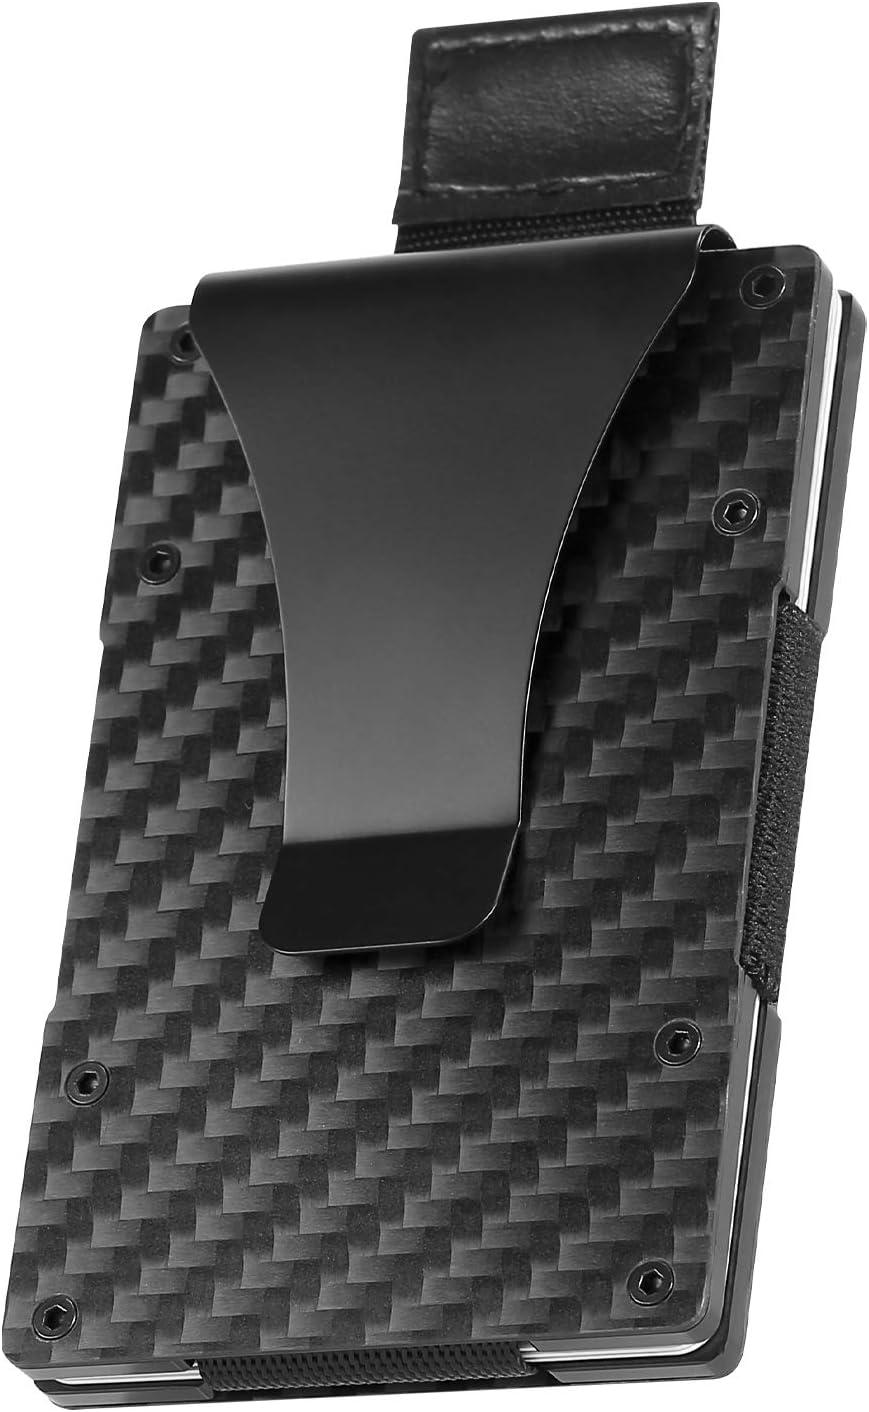 Carbon Fiber Wallet for Men, Geelyda RFID Blocking Slim Minimalist Wallet with Money Clip, Metal Aluminum Credit Card Holder, Gift Boxed